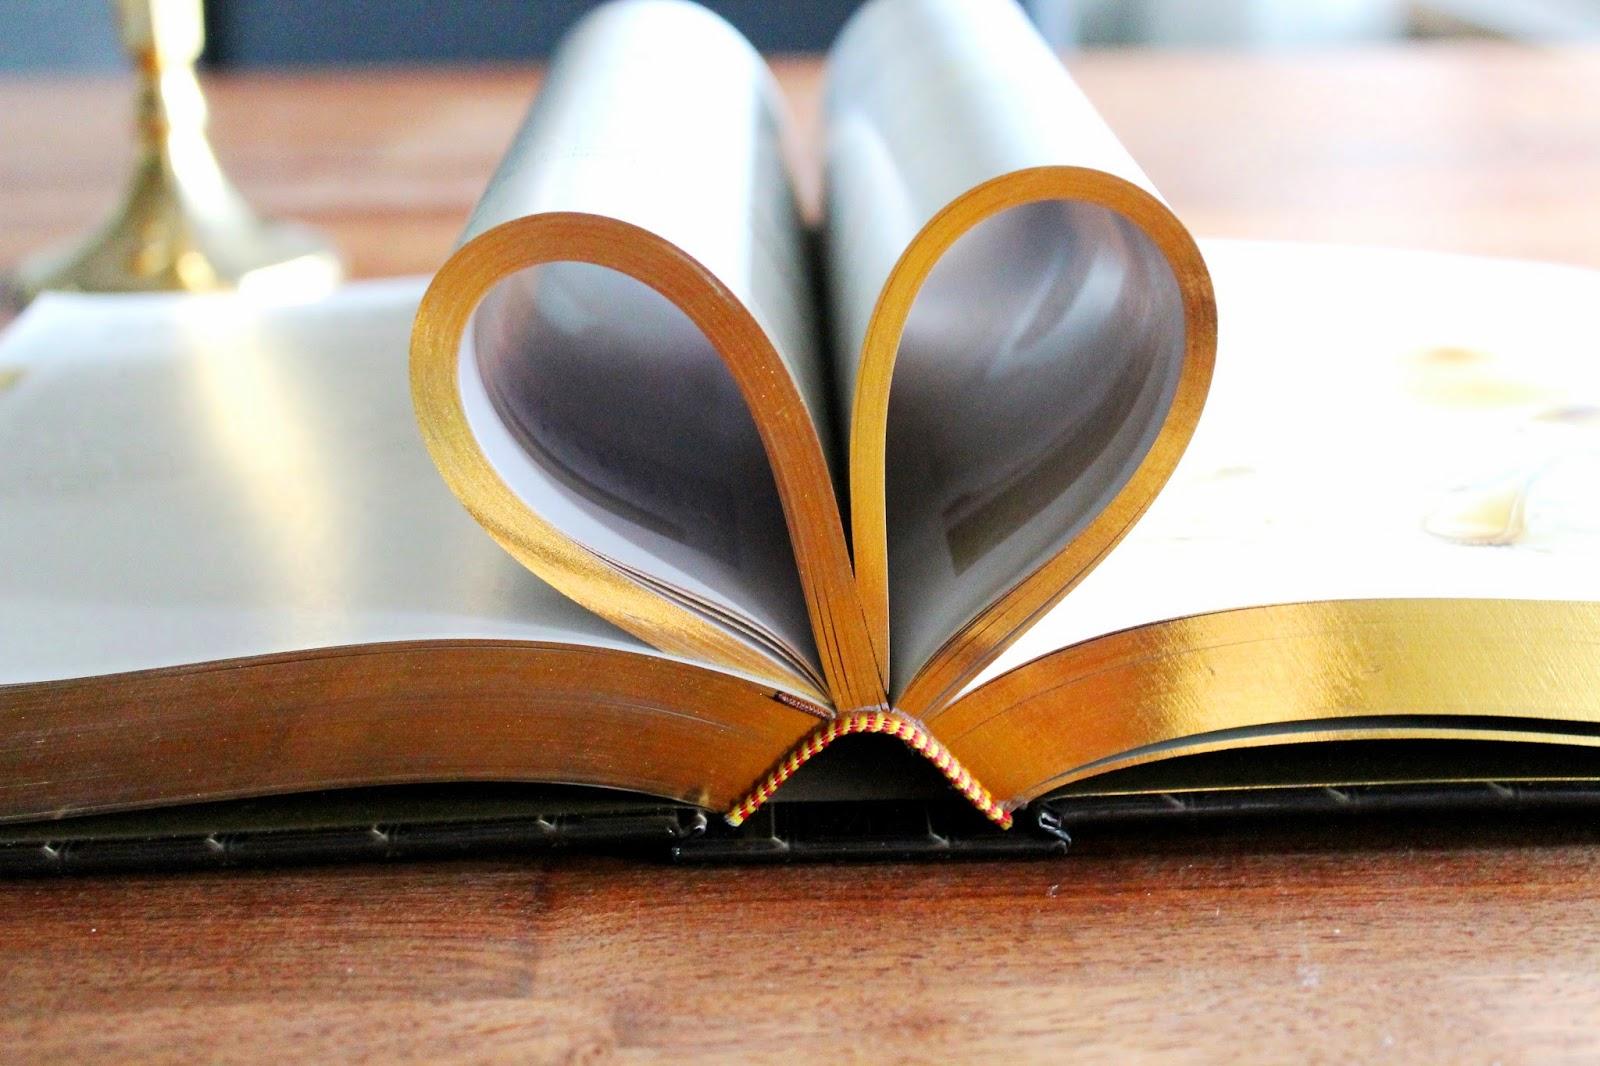 Golden heart, booklover   Alinan kotona blog #booklover #gold #heart #books